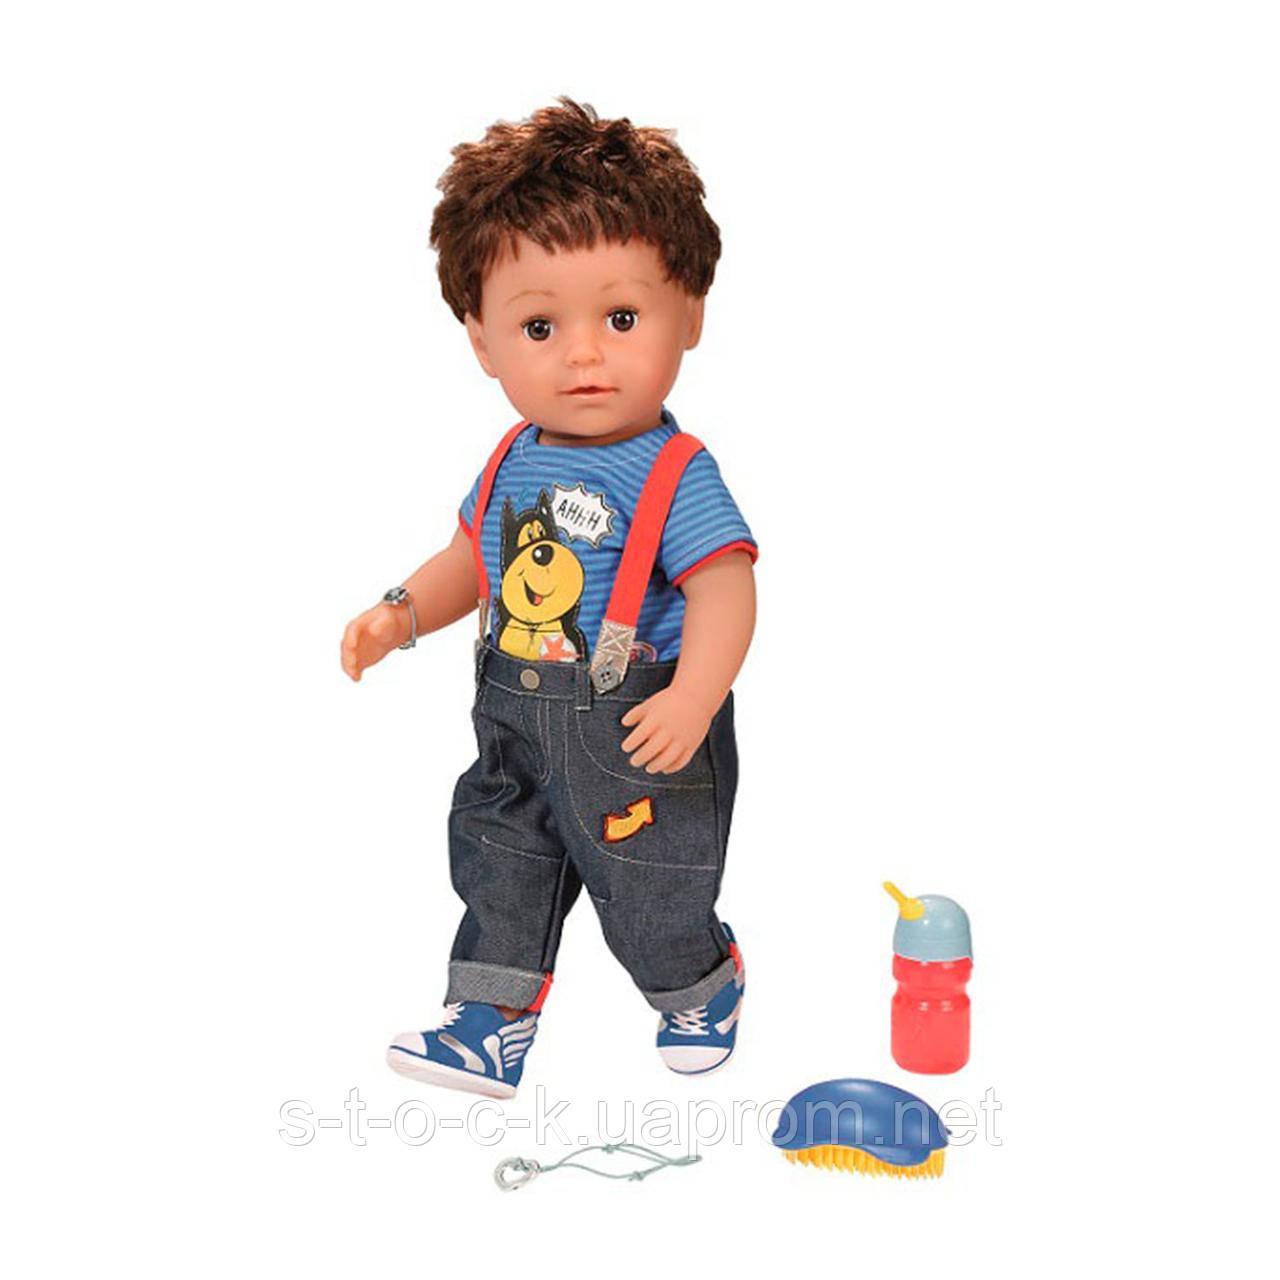 Кукла Baby Born 825365. Милый братишка!